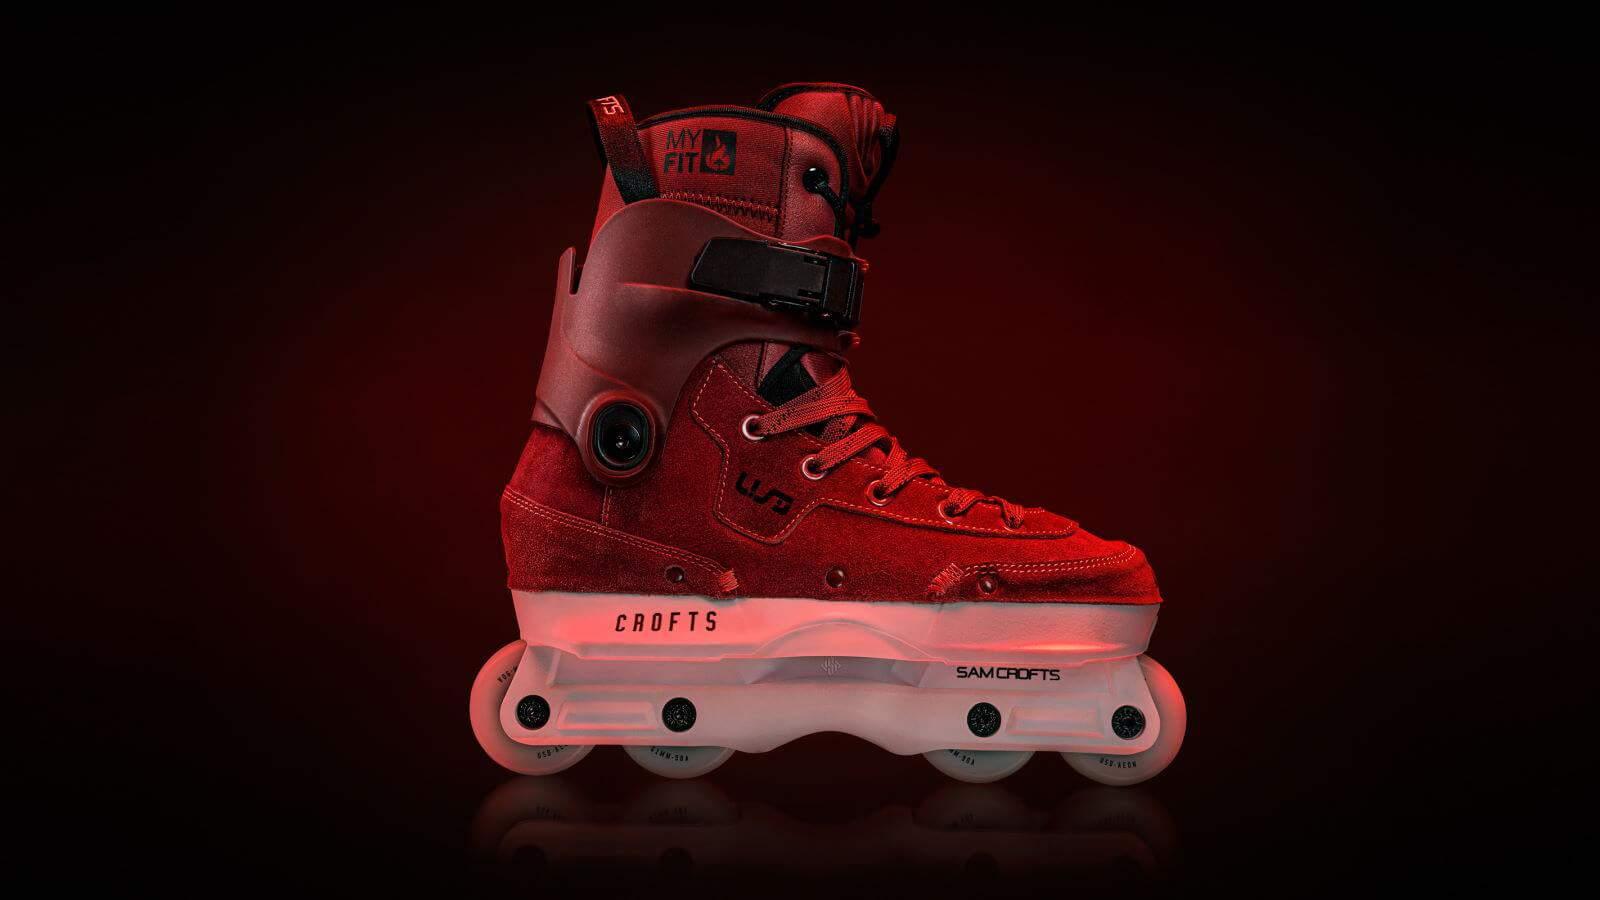 USD Aeon 60 Sam Crofts Pro 2021 | Red